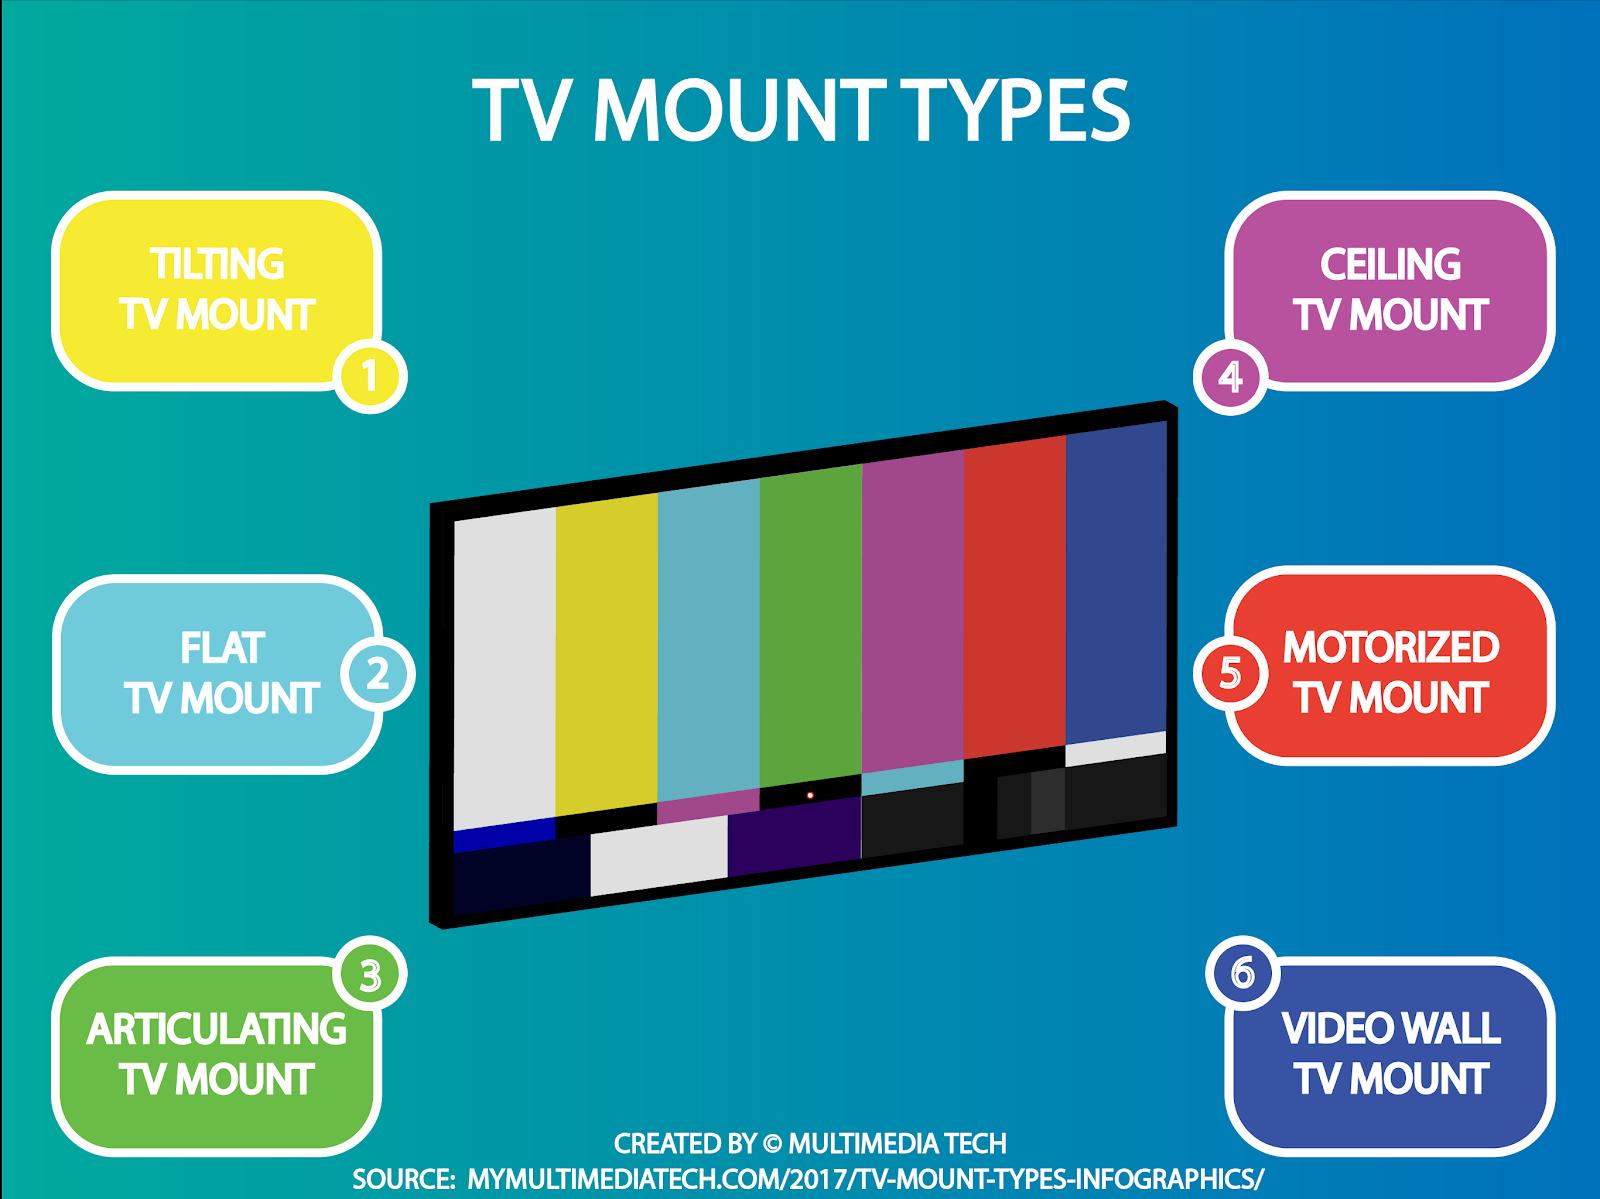 TV Mount Types Infographic